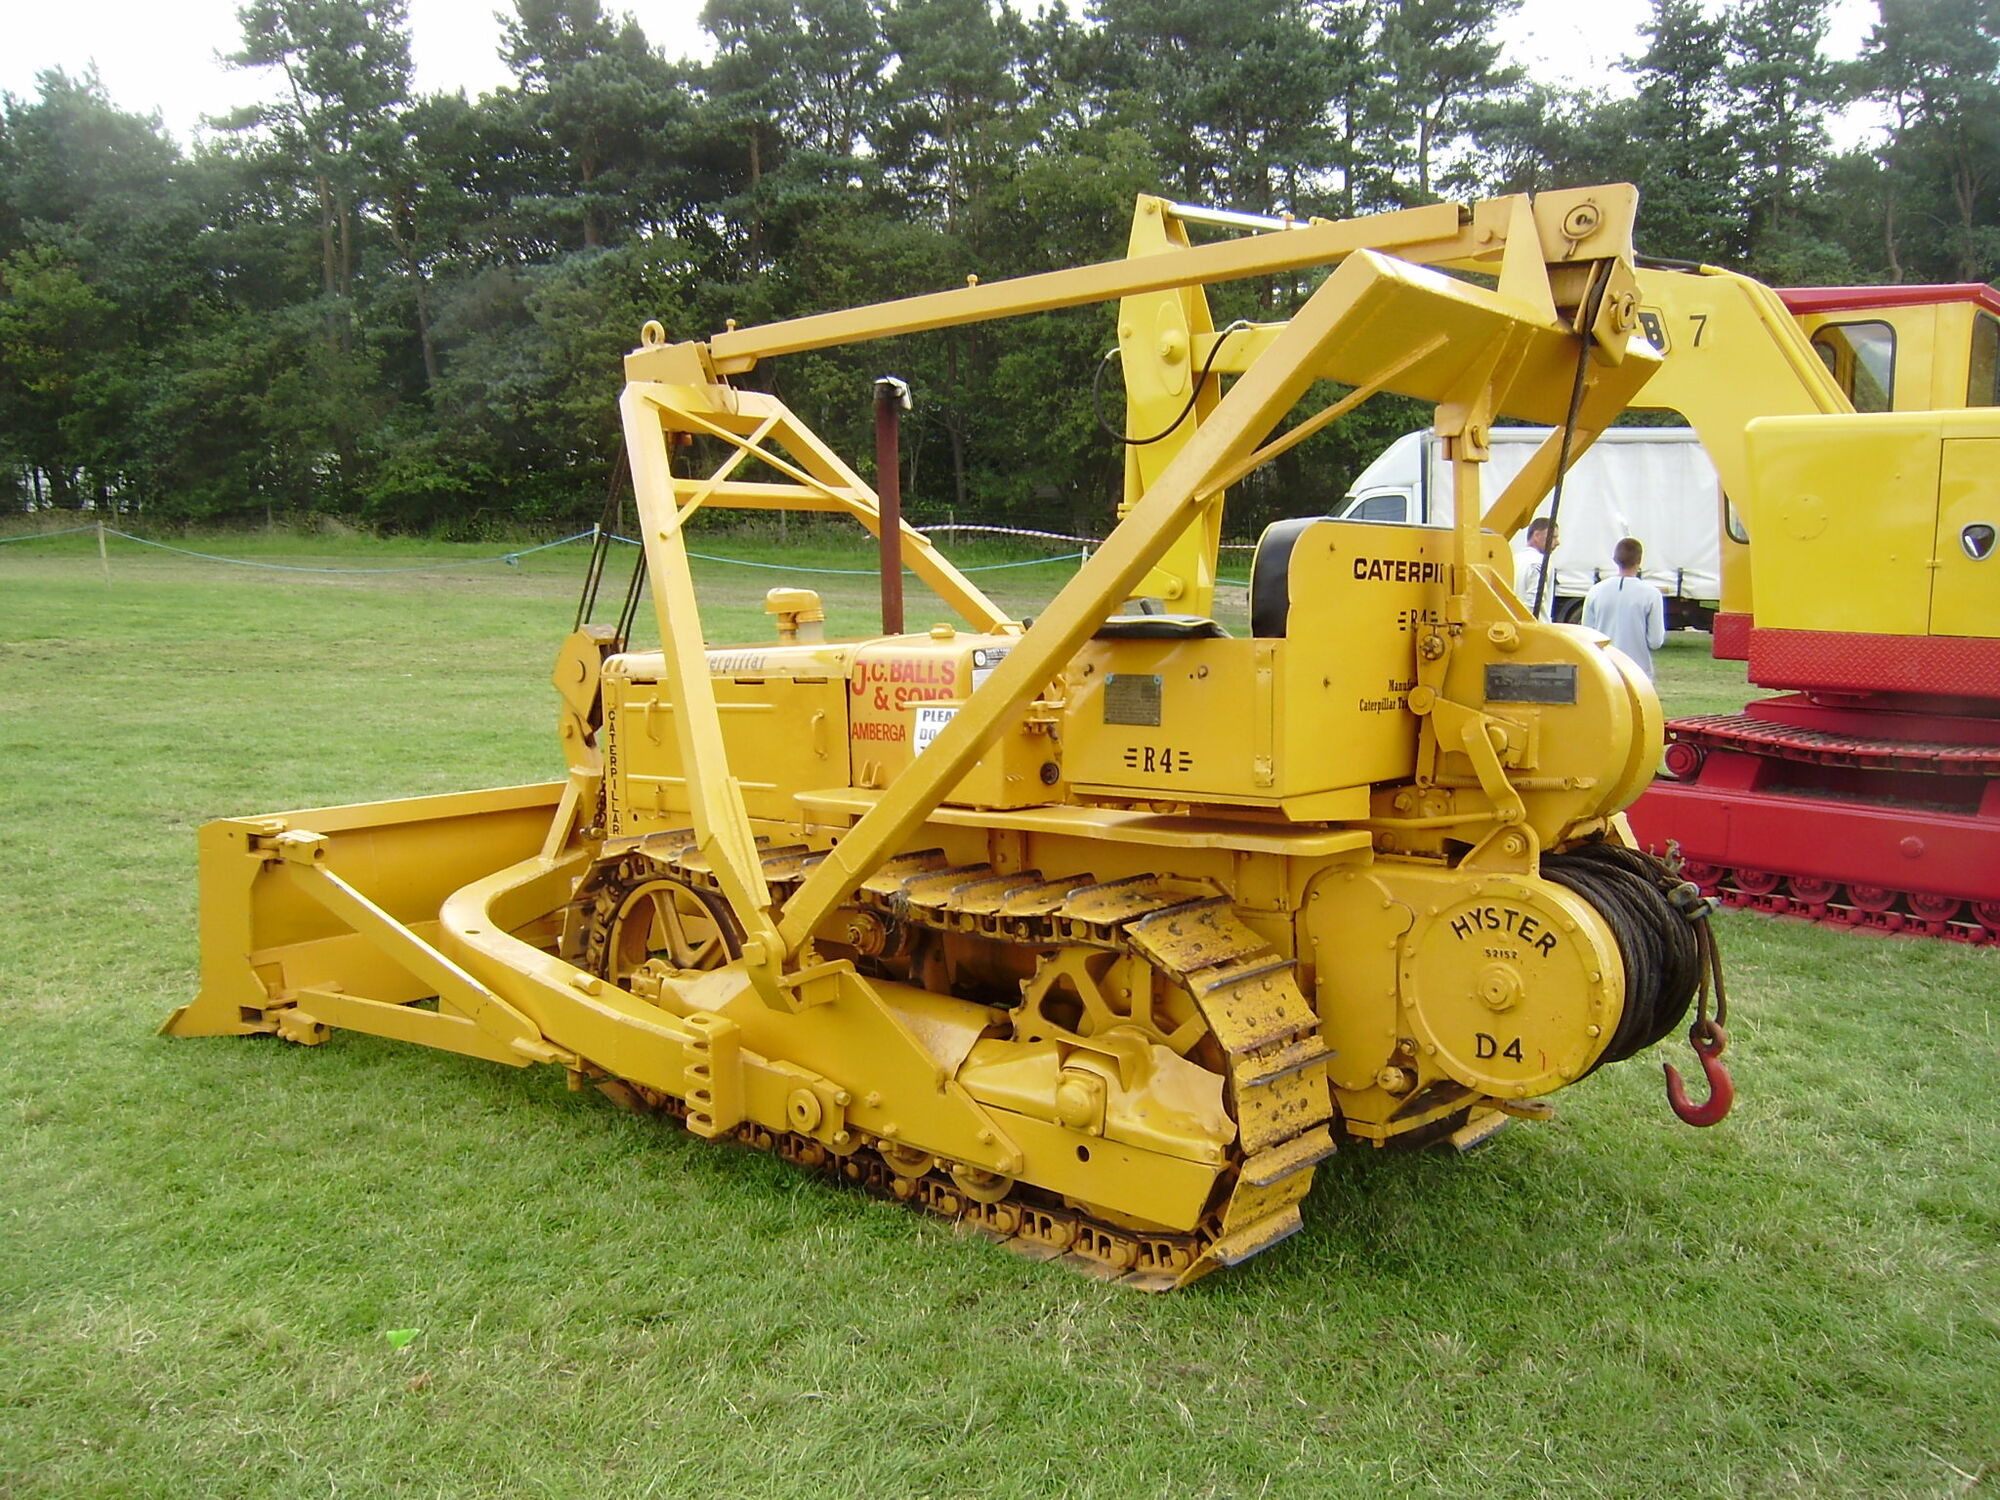 Caterpillar Inc  | Tractor & Construction Plant Wiki | FANDOM